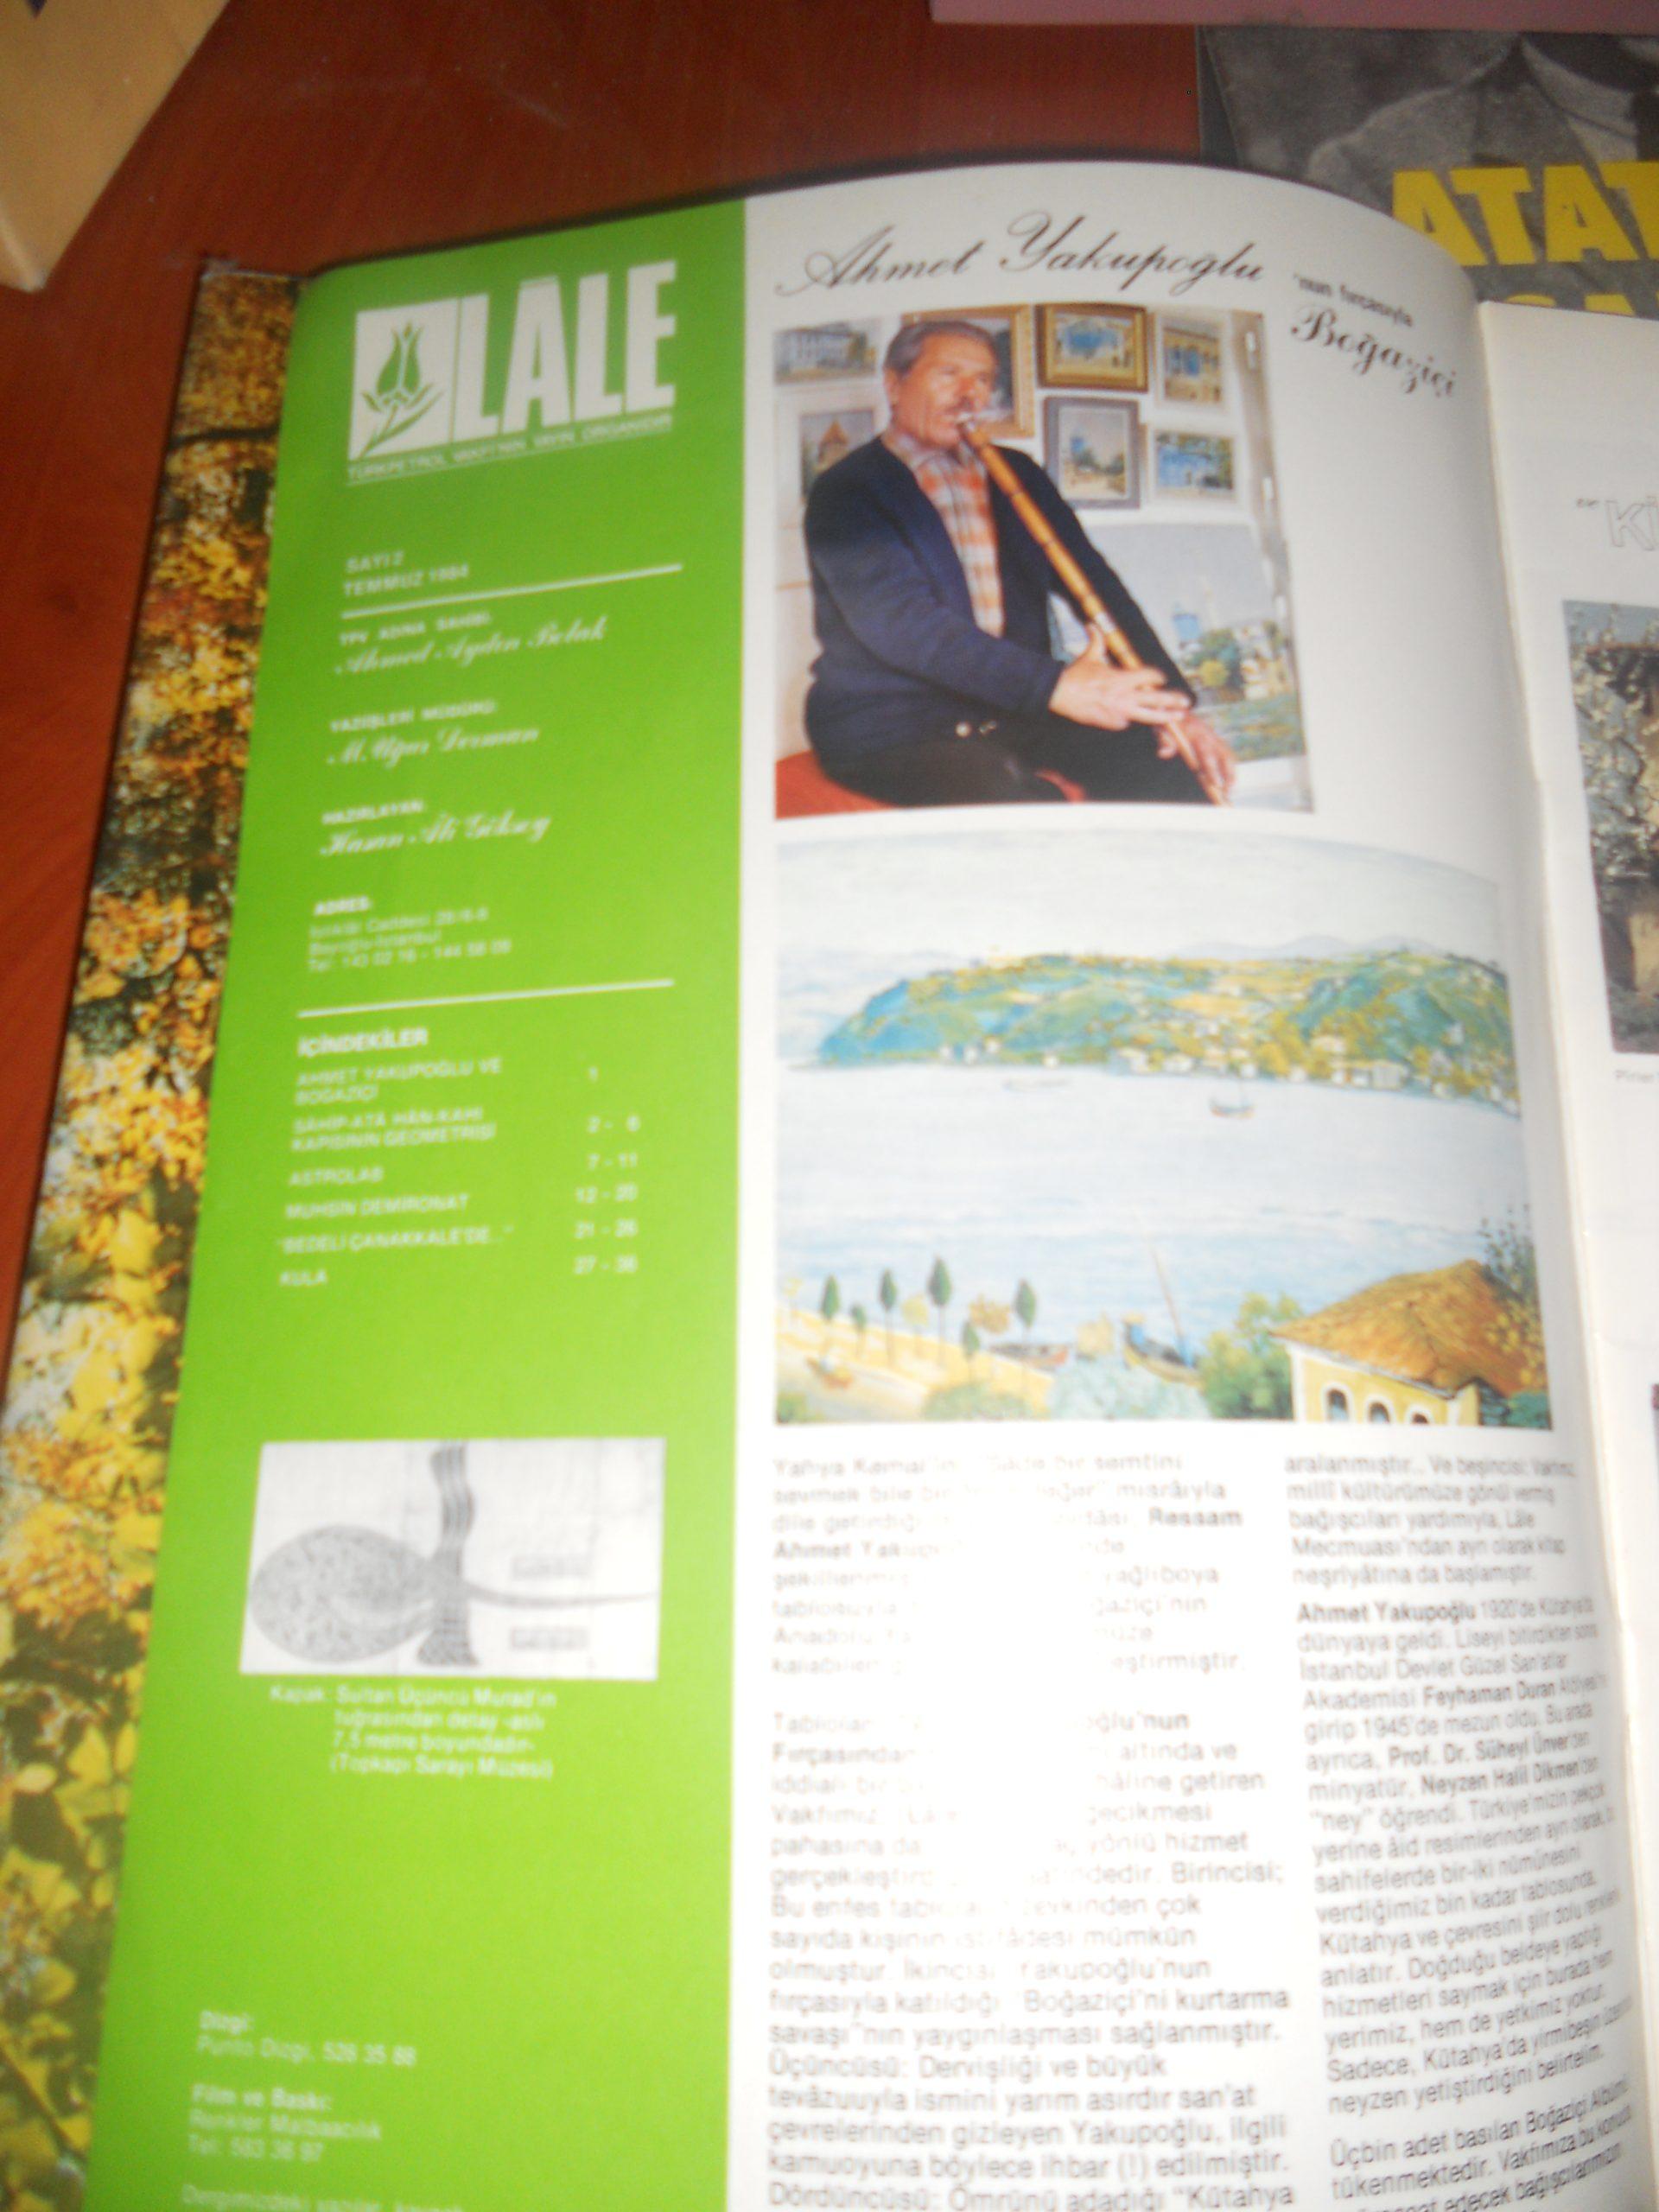 LALE (5 ADET) 1987/İLGİ (2 ADET) 1979/ 7 dergi/Toplam  50 tl